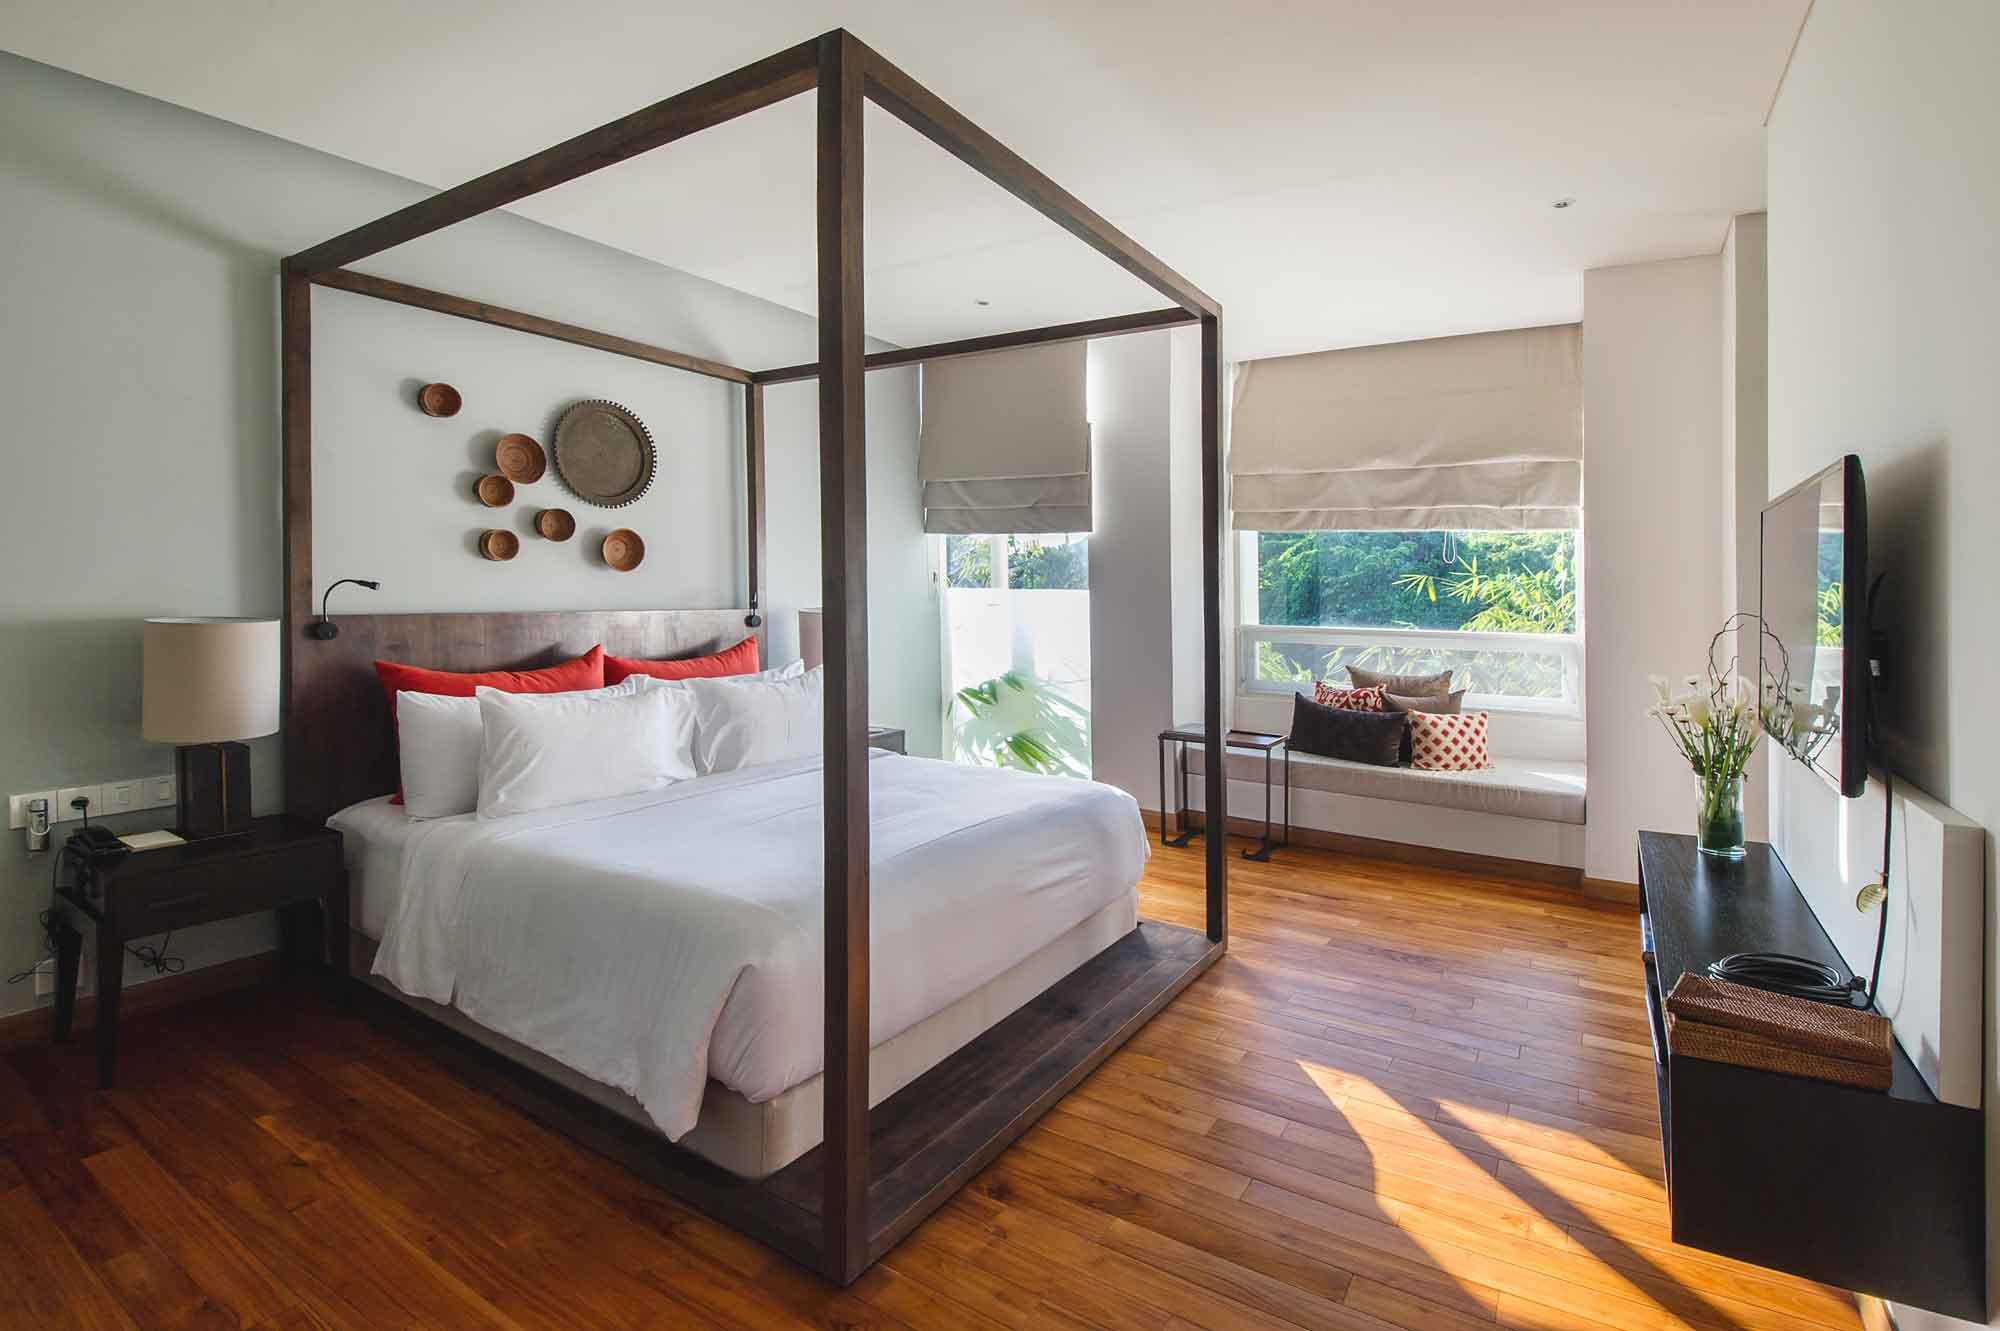 Bali Luxury 2 Bedroom Villas Jalan Petitenget, Seminyak, Bali 80361